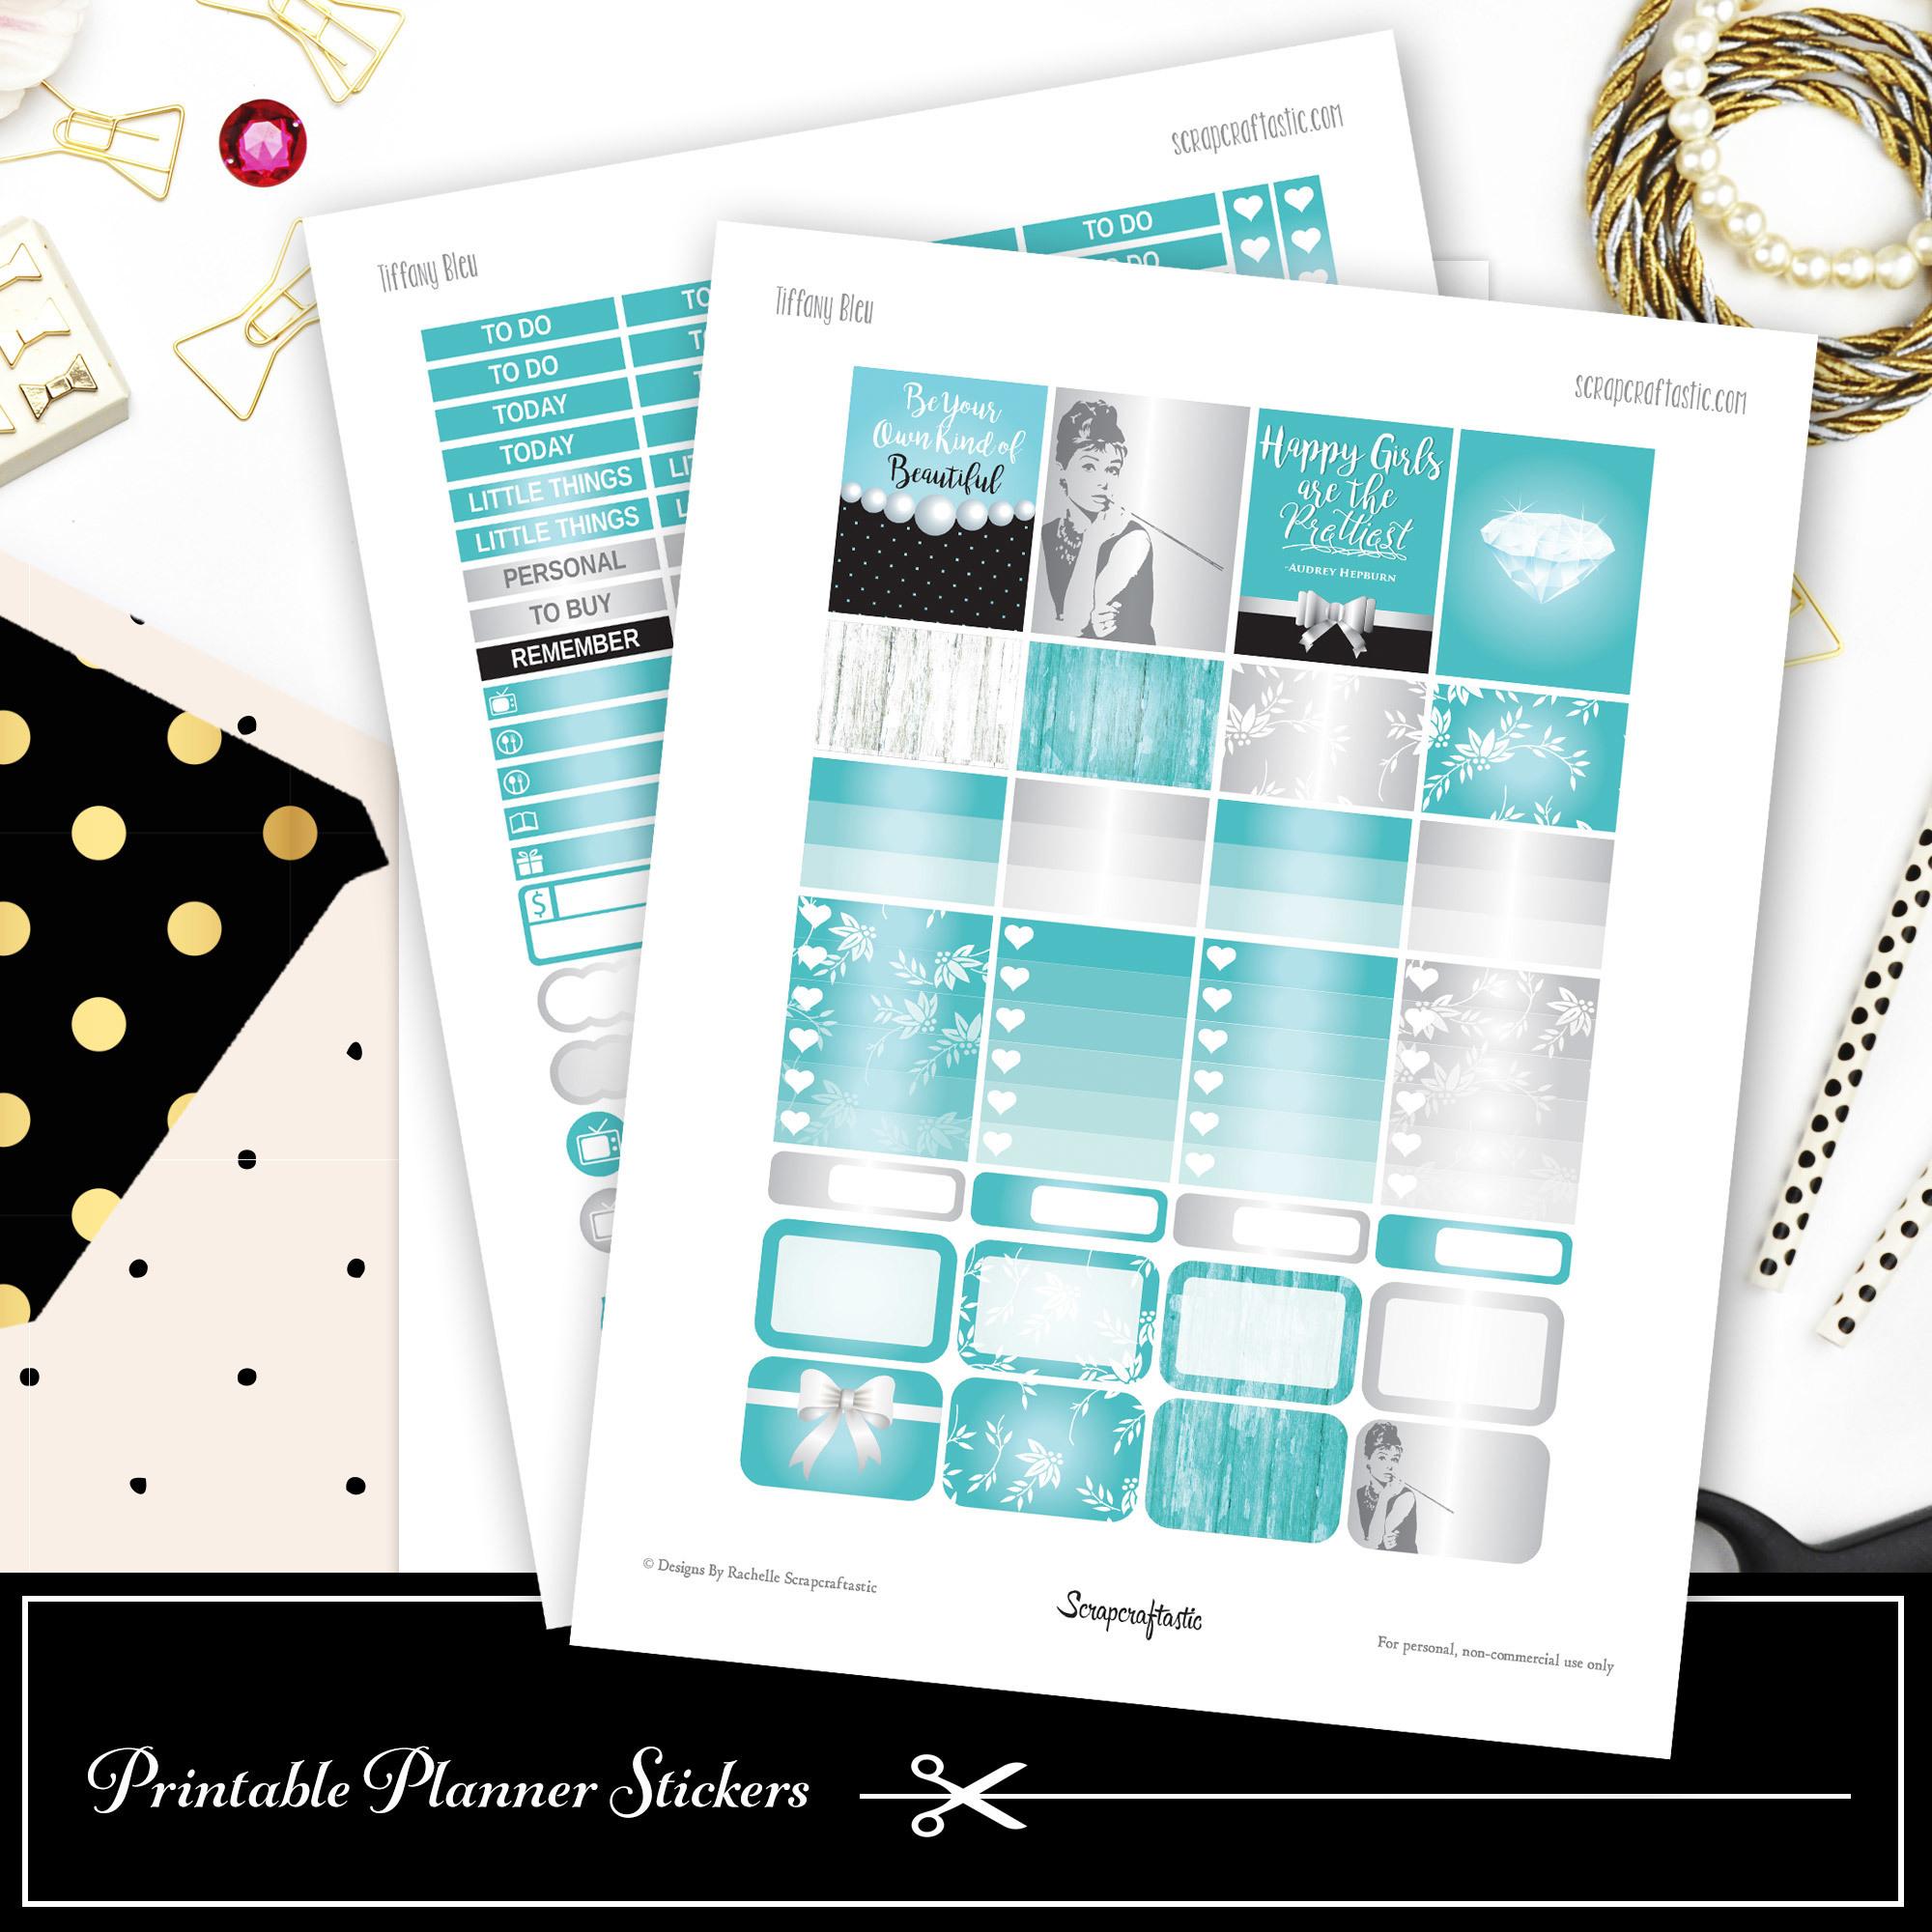 Tiffany Bleu Printable Planner Stickers dbr_tiffanybleu